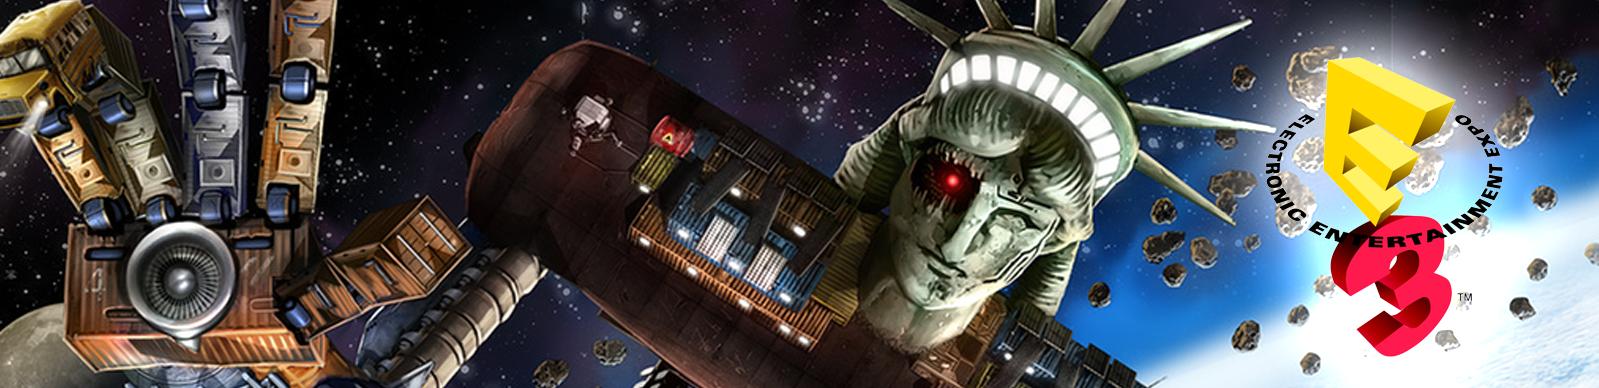 Habitat E3 Trailer